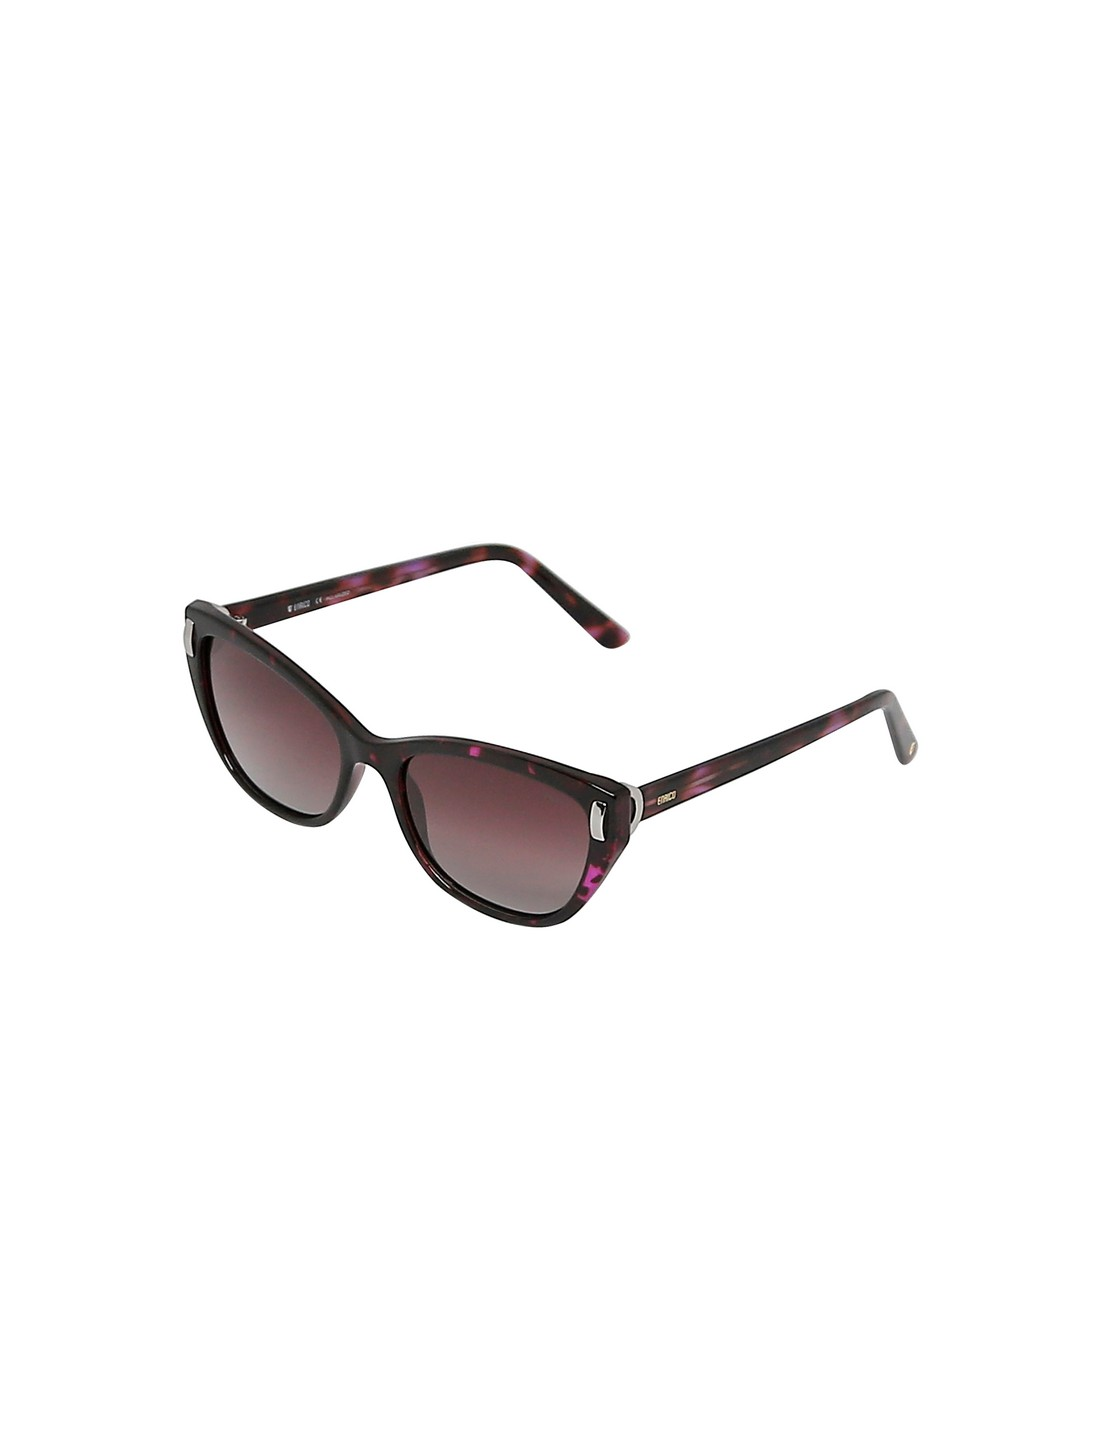 ENRICO   ENRICO Dahlia UV Protected & Polarized Cateye Sunglasses for Women ( Lens - Pink   Frame - Pink)